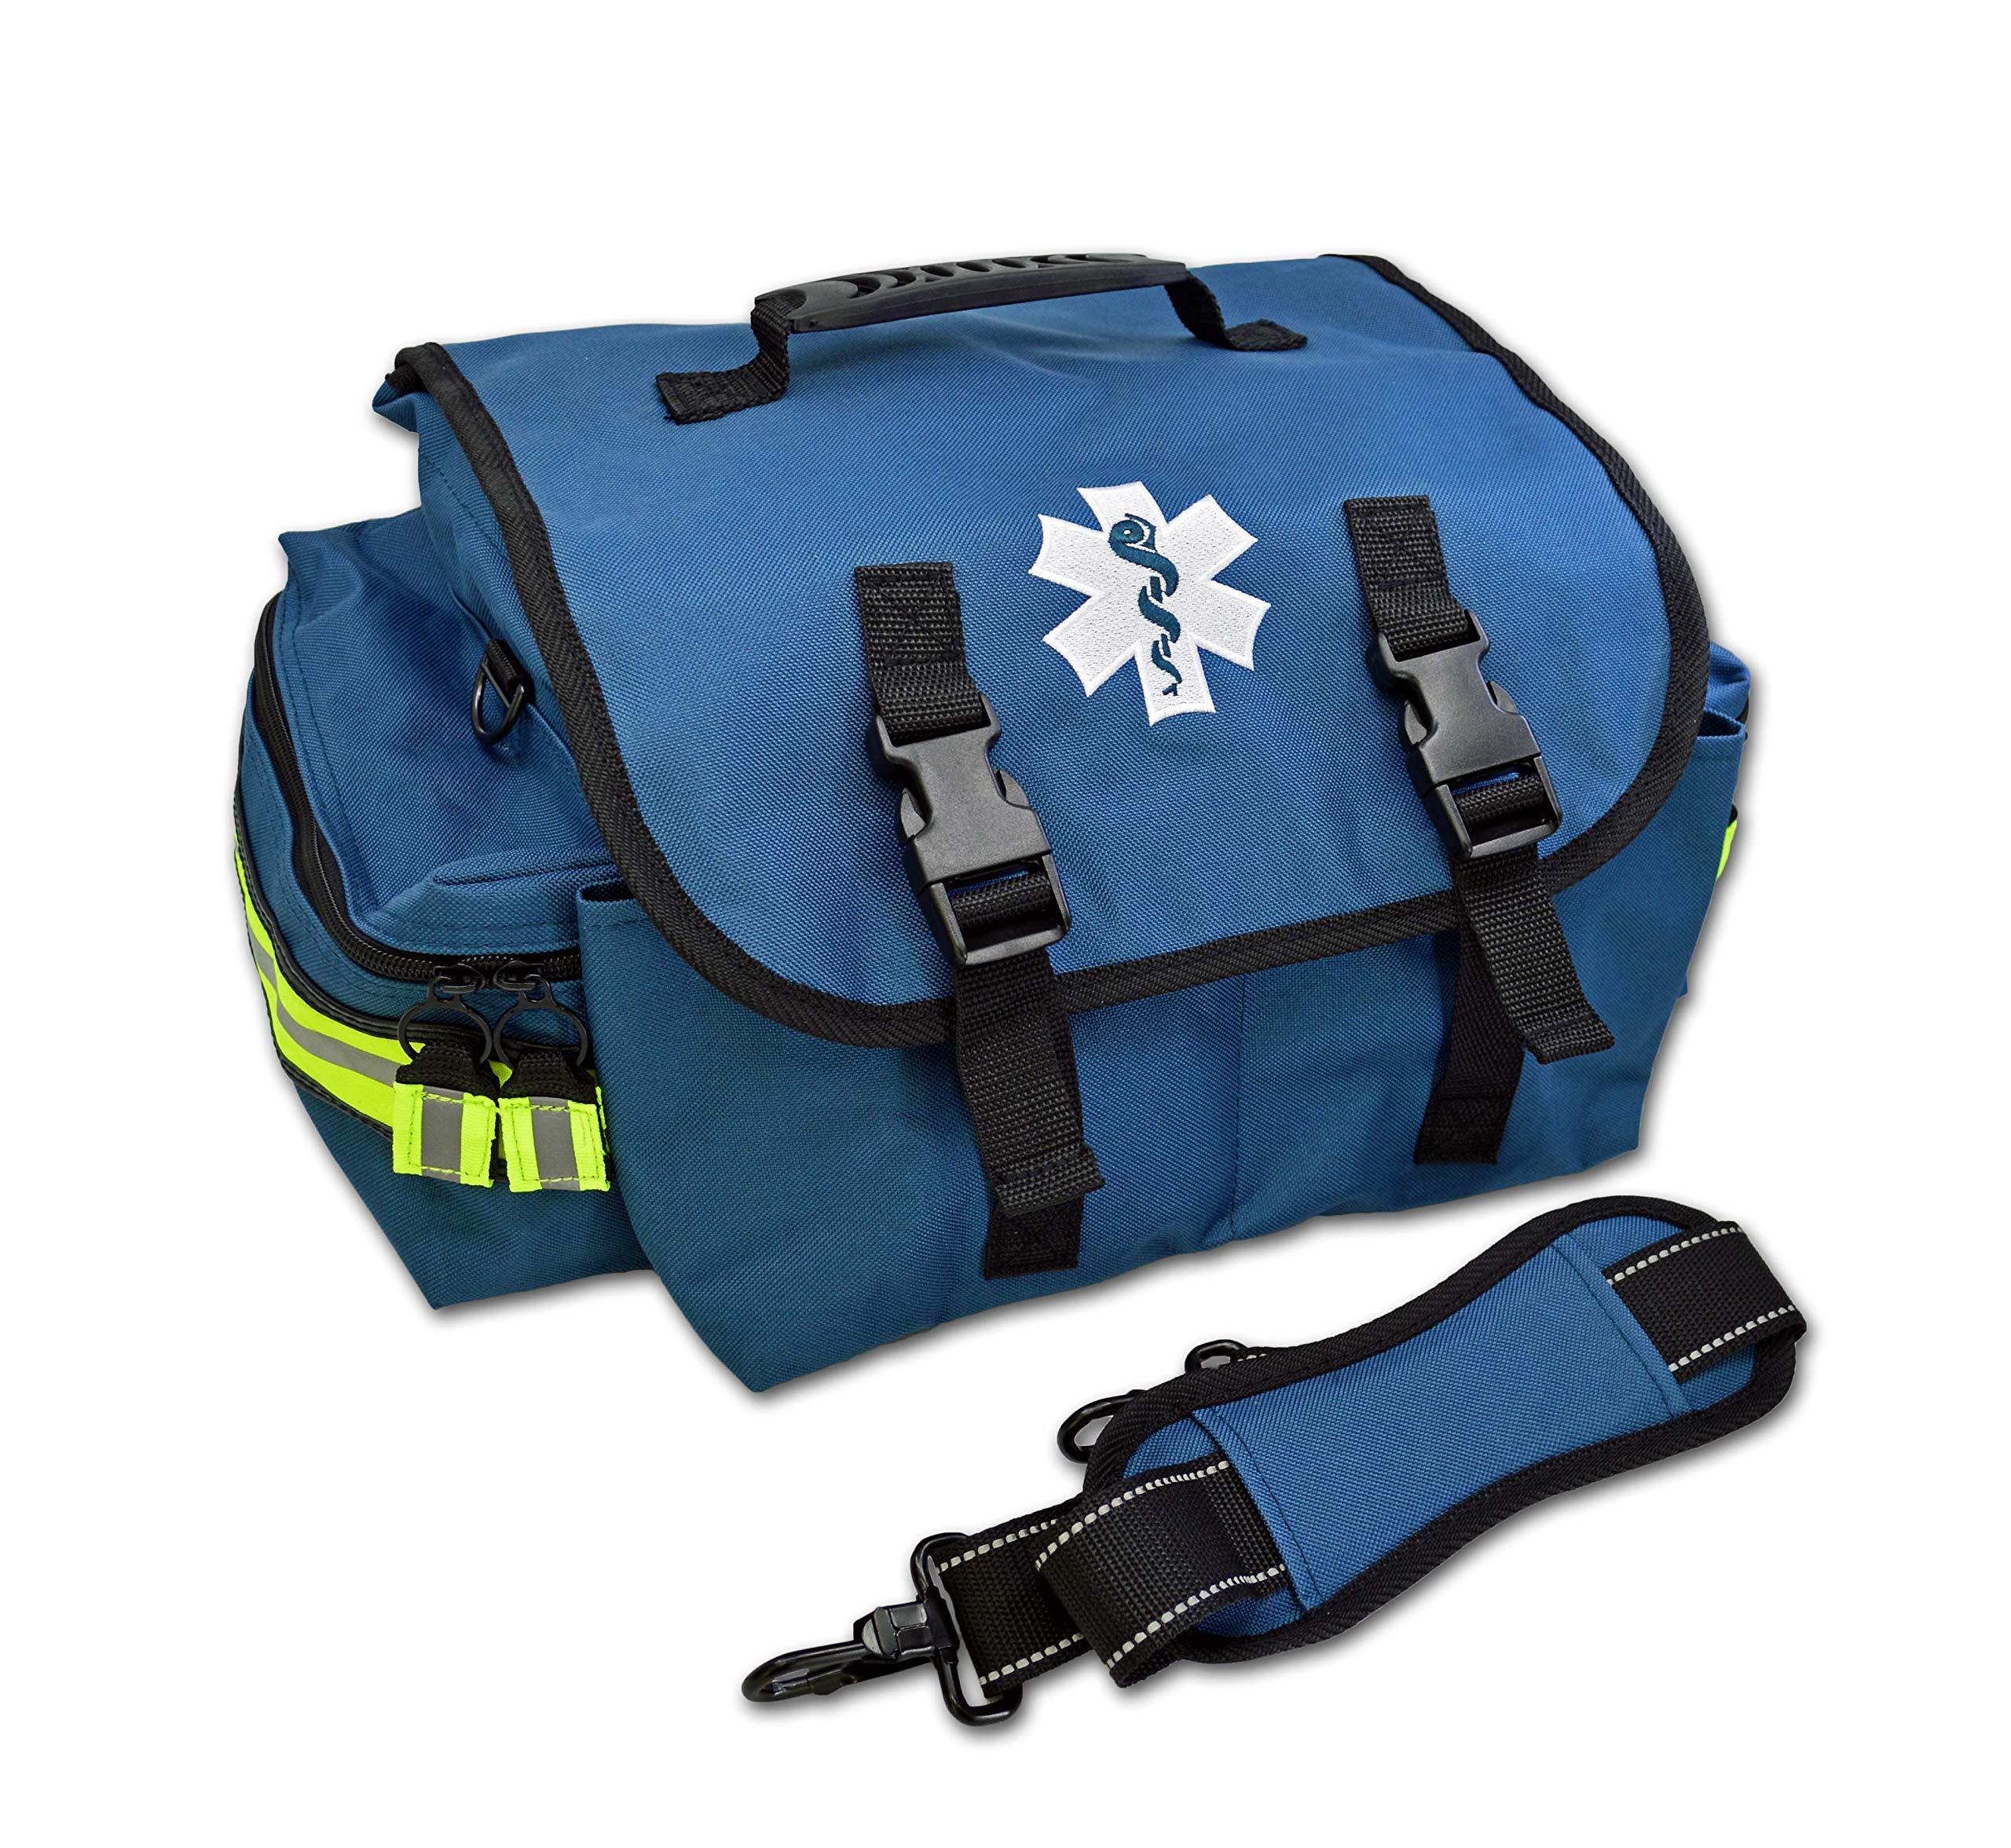 Lightning X Small EMT First Responder Bag w/Dividers - NAVY BLUE